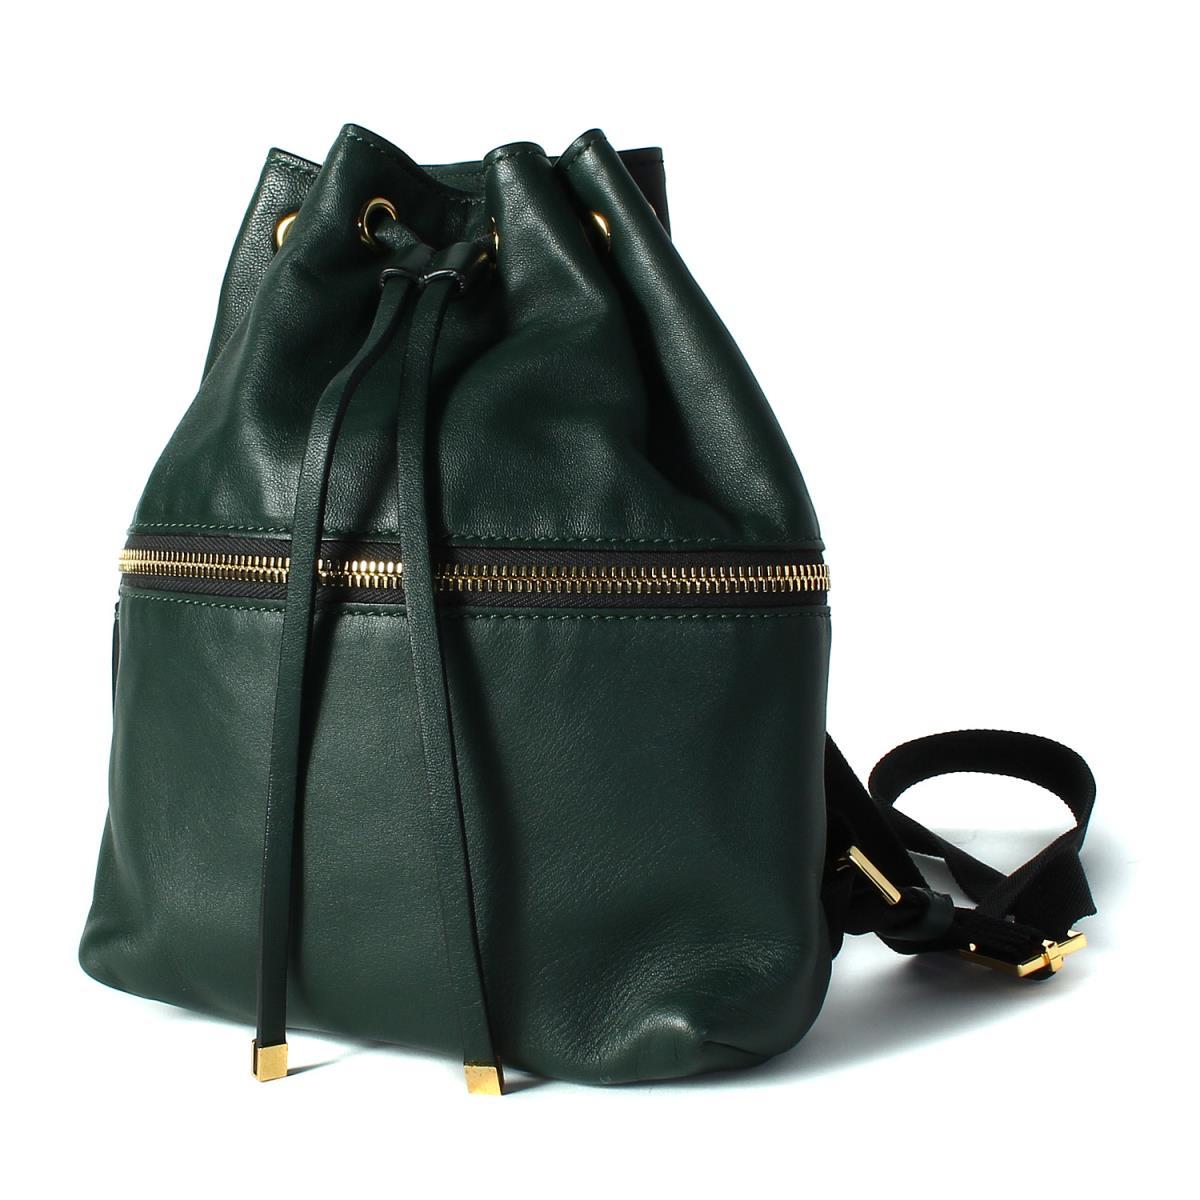 b10ddc9c7575 MARNI(マルニ) レザー ミニリュック バックパック 巾着 モスグリーン×ブラック【K2214